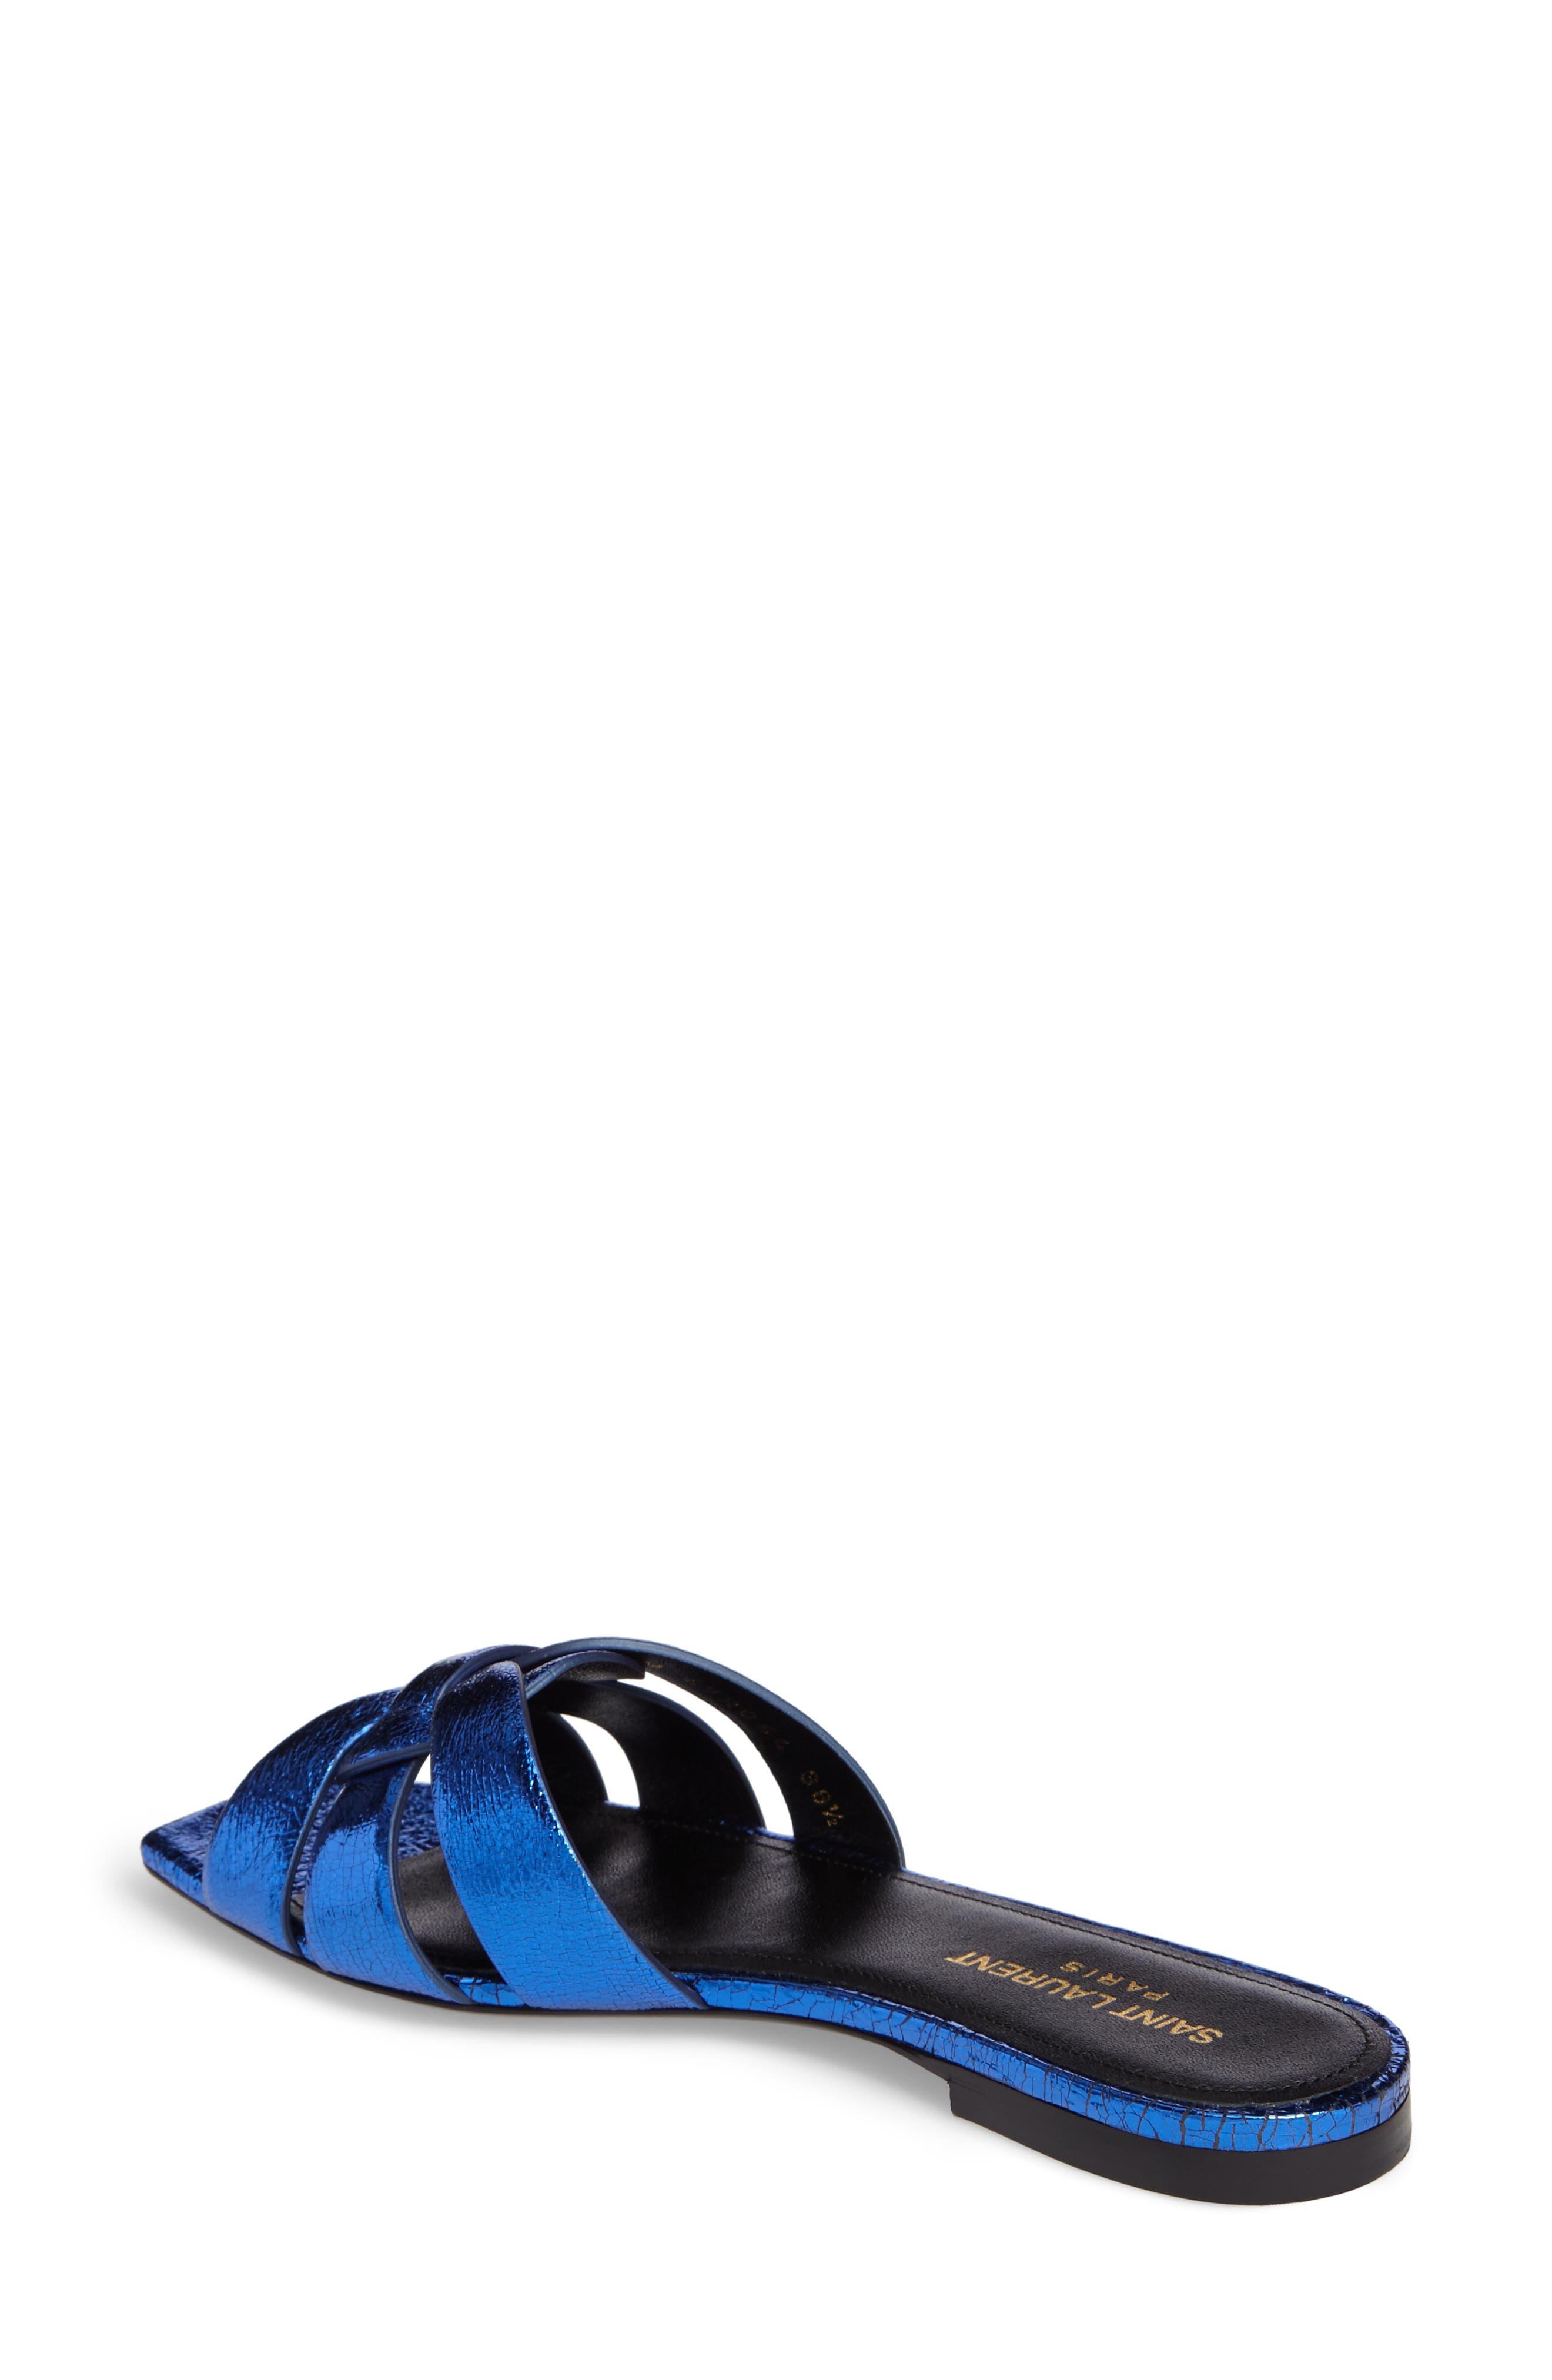 Pieds Metallic Slide Sandal,                             Alternate thumbnail 2, color,                             450